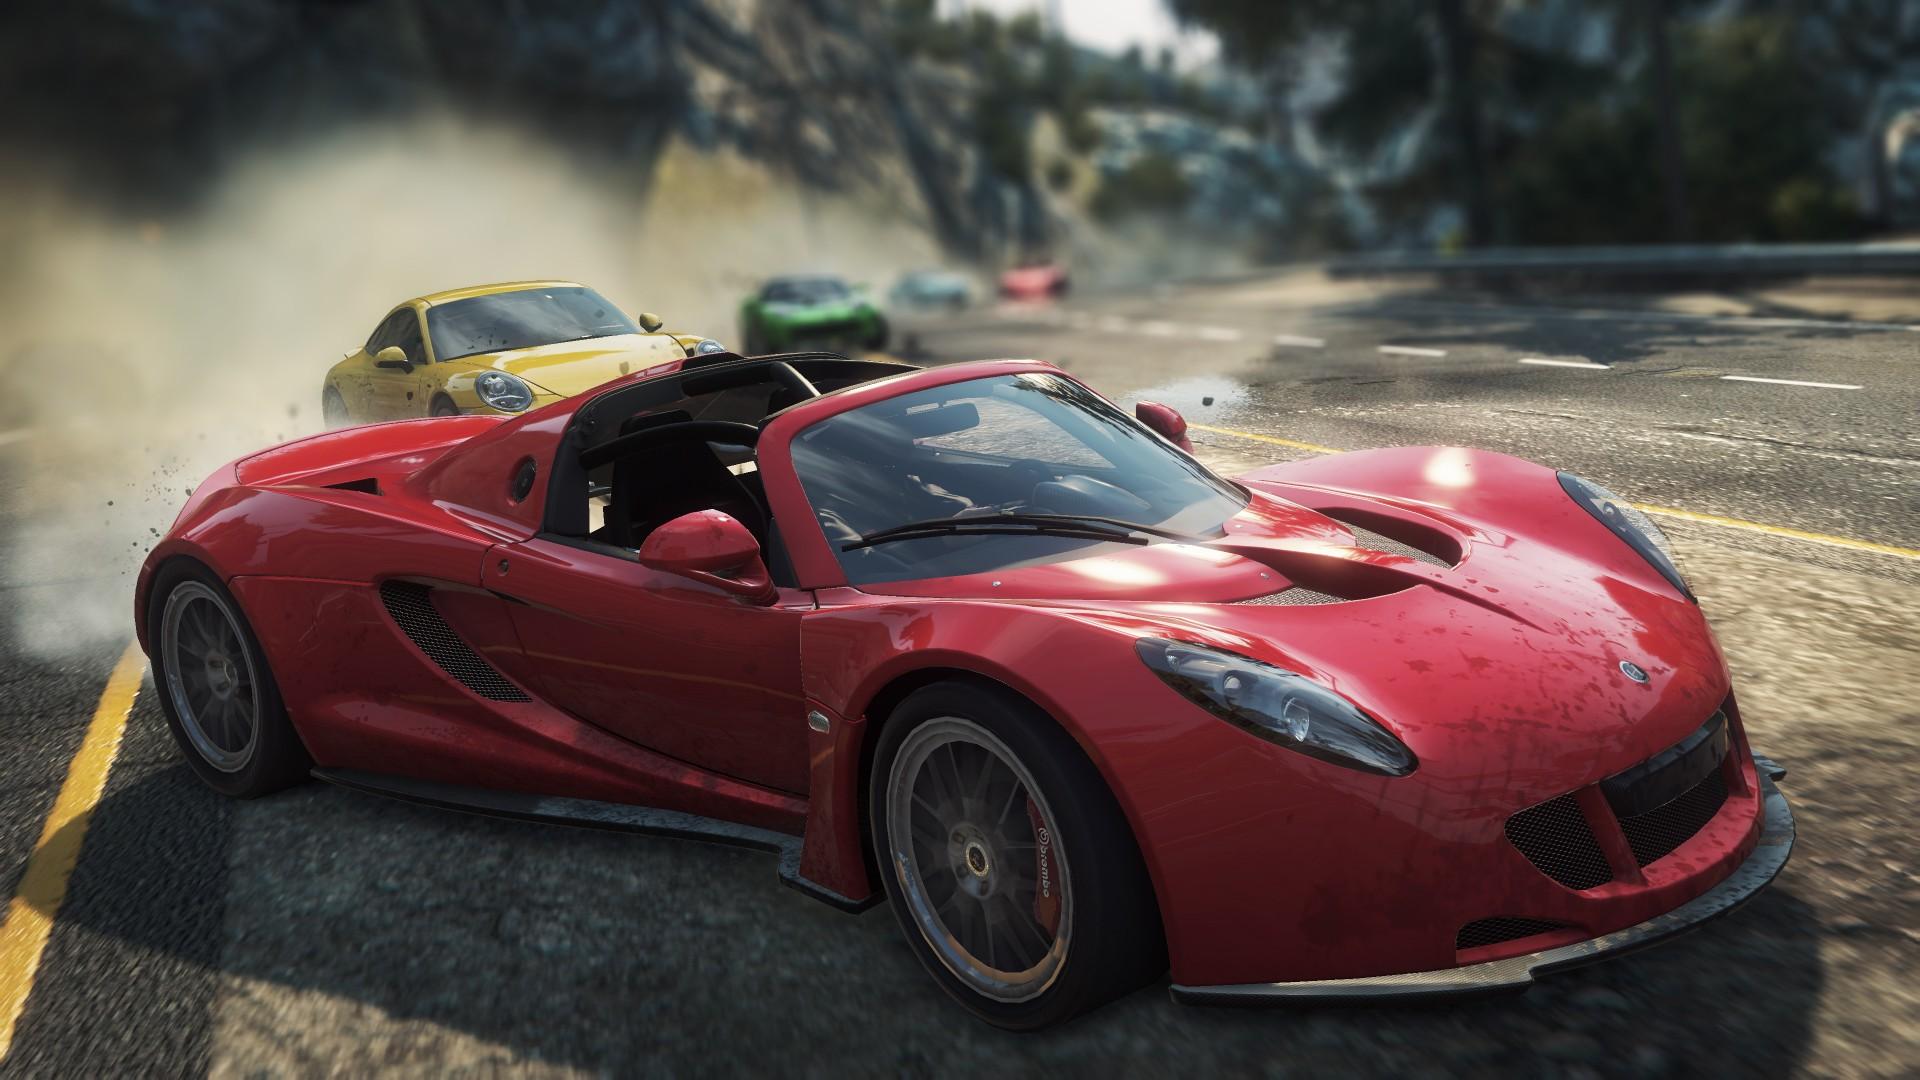 Hennessey-Venom-GT-Spyder Mesmerizing Bugatti Veyron Nfs Most Wanted Cars Trend